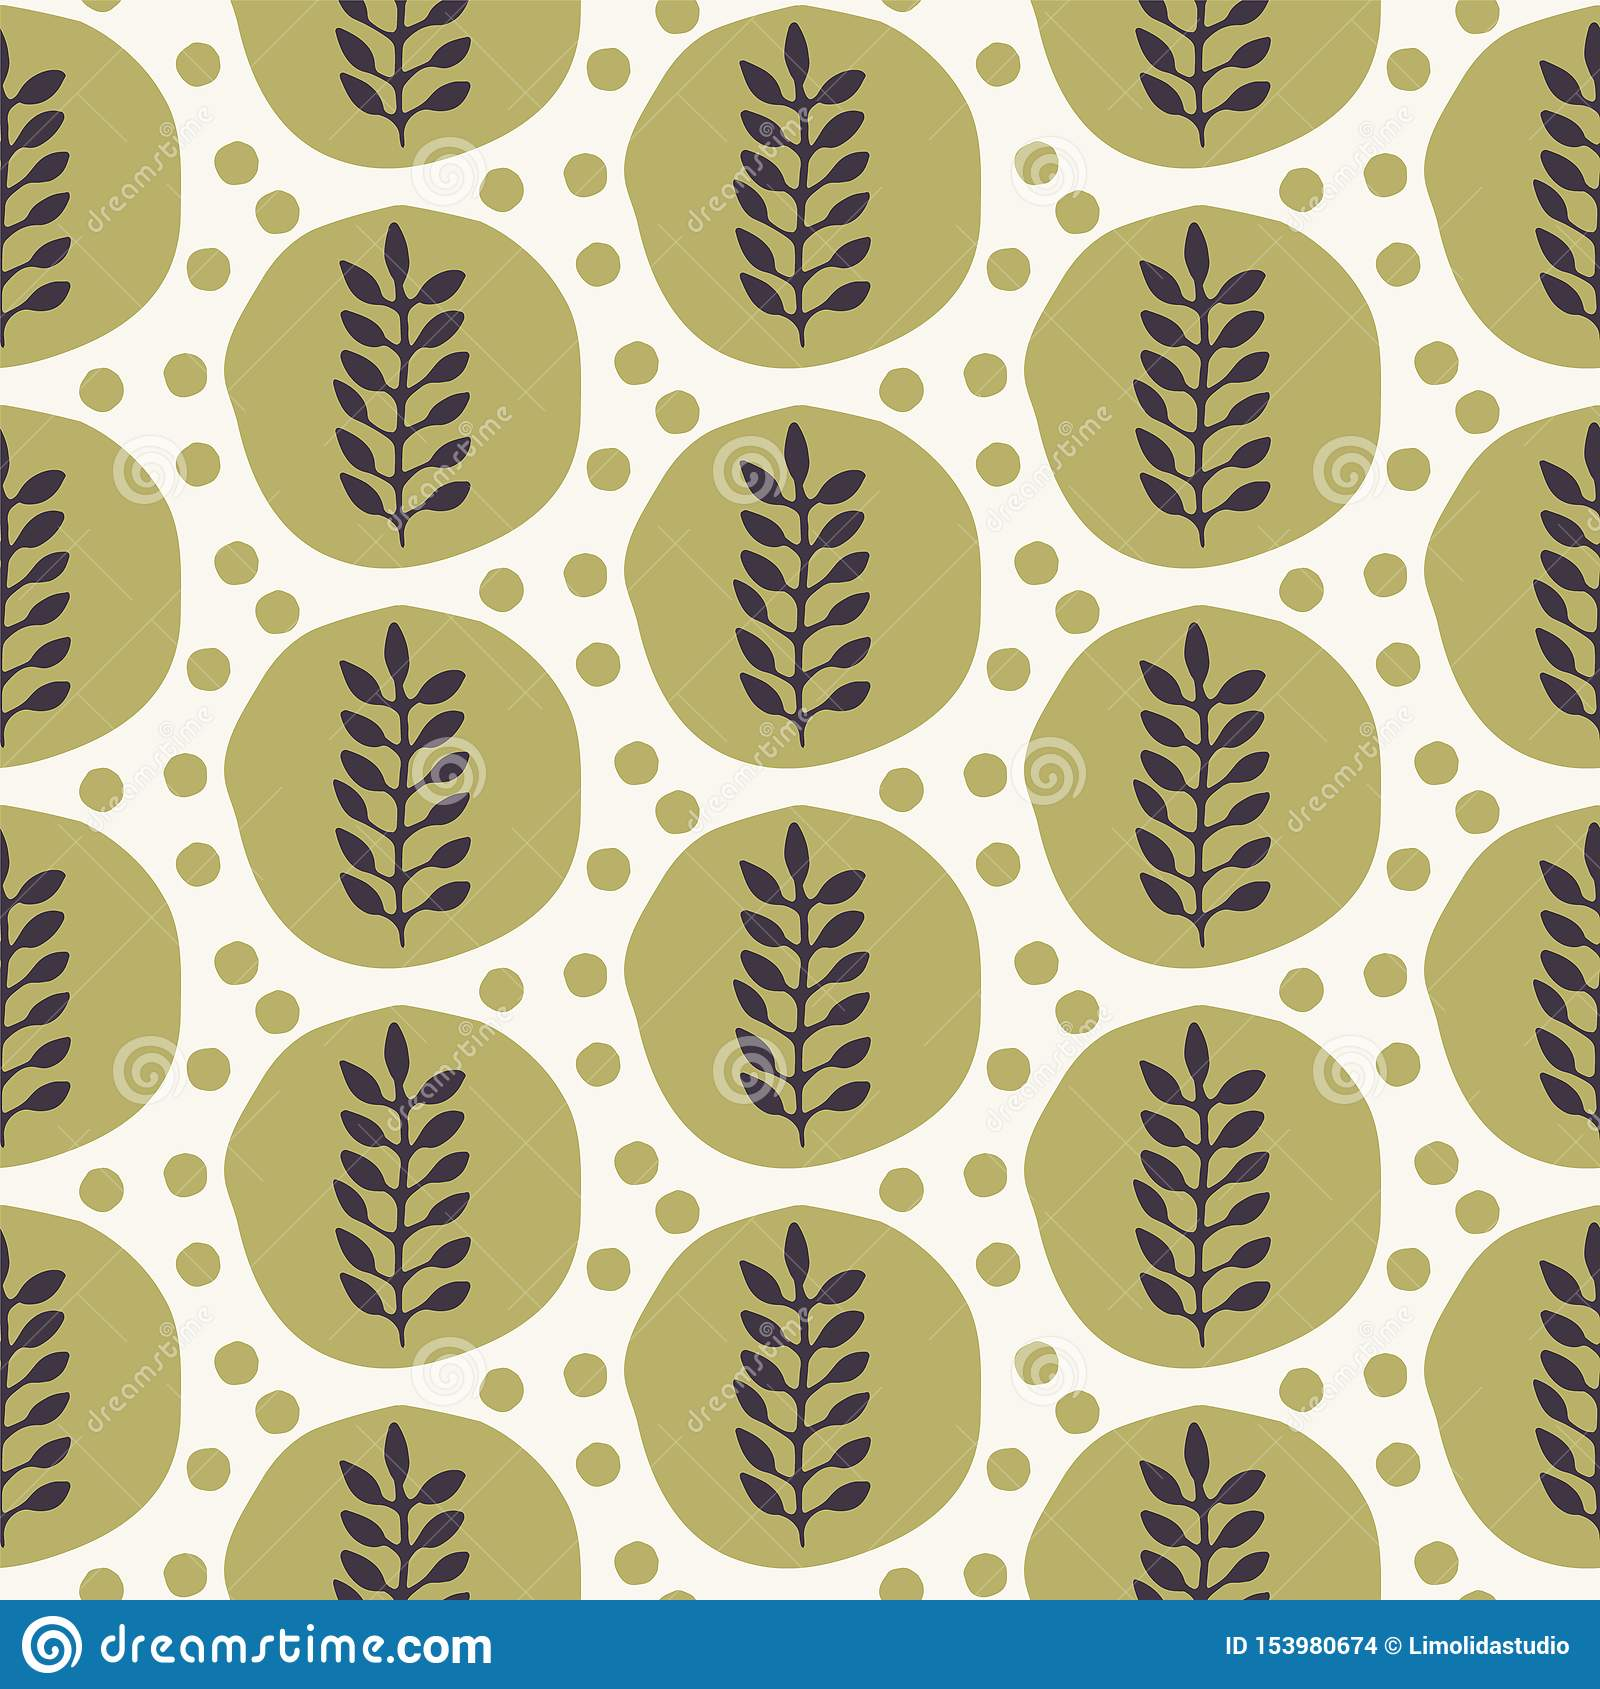 floral-ethnic-leaf-motif-scandi-style-vector-seamless-pattern-folk-art-nature-carved-block-textiles-swatch-modern-monochrome-home-153980674